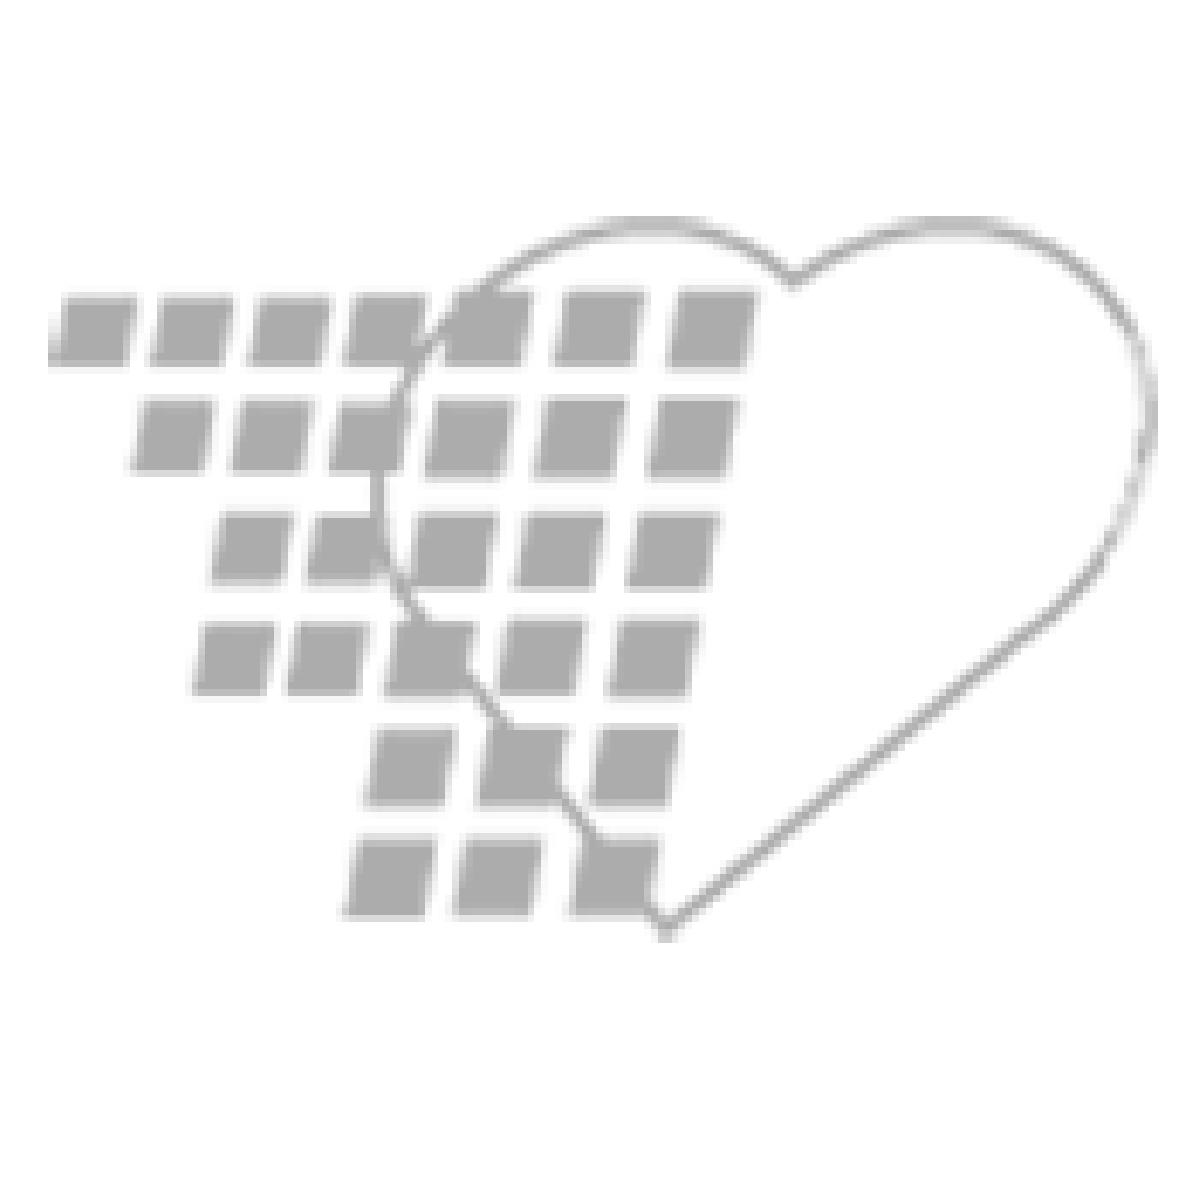 06-51-8029 - Pocket Nurse® Central Line Change Tray with Transparent Dressing